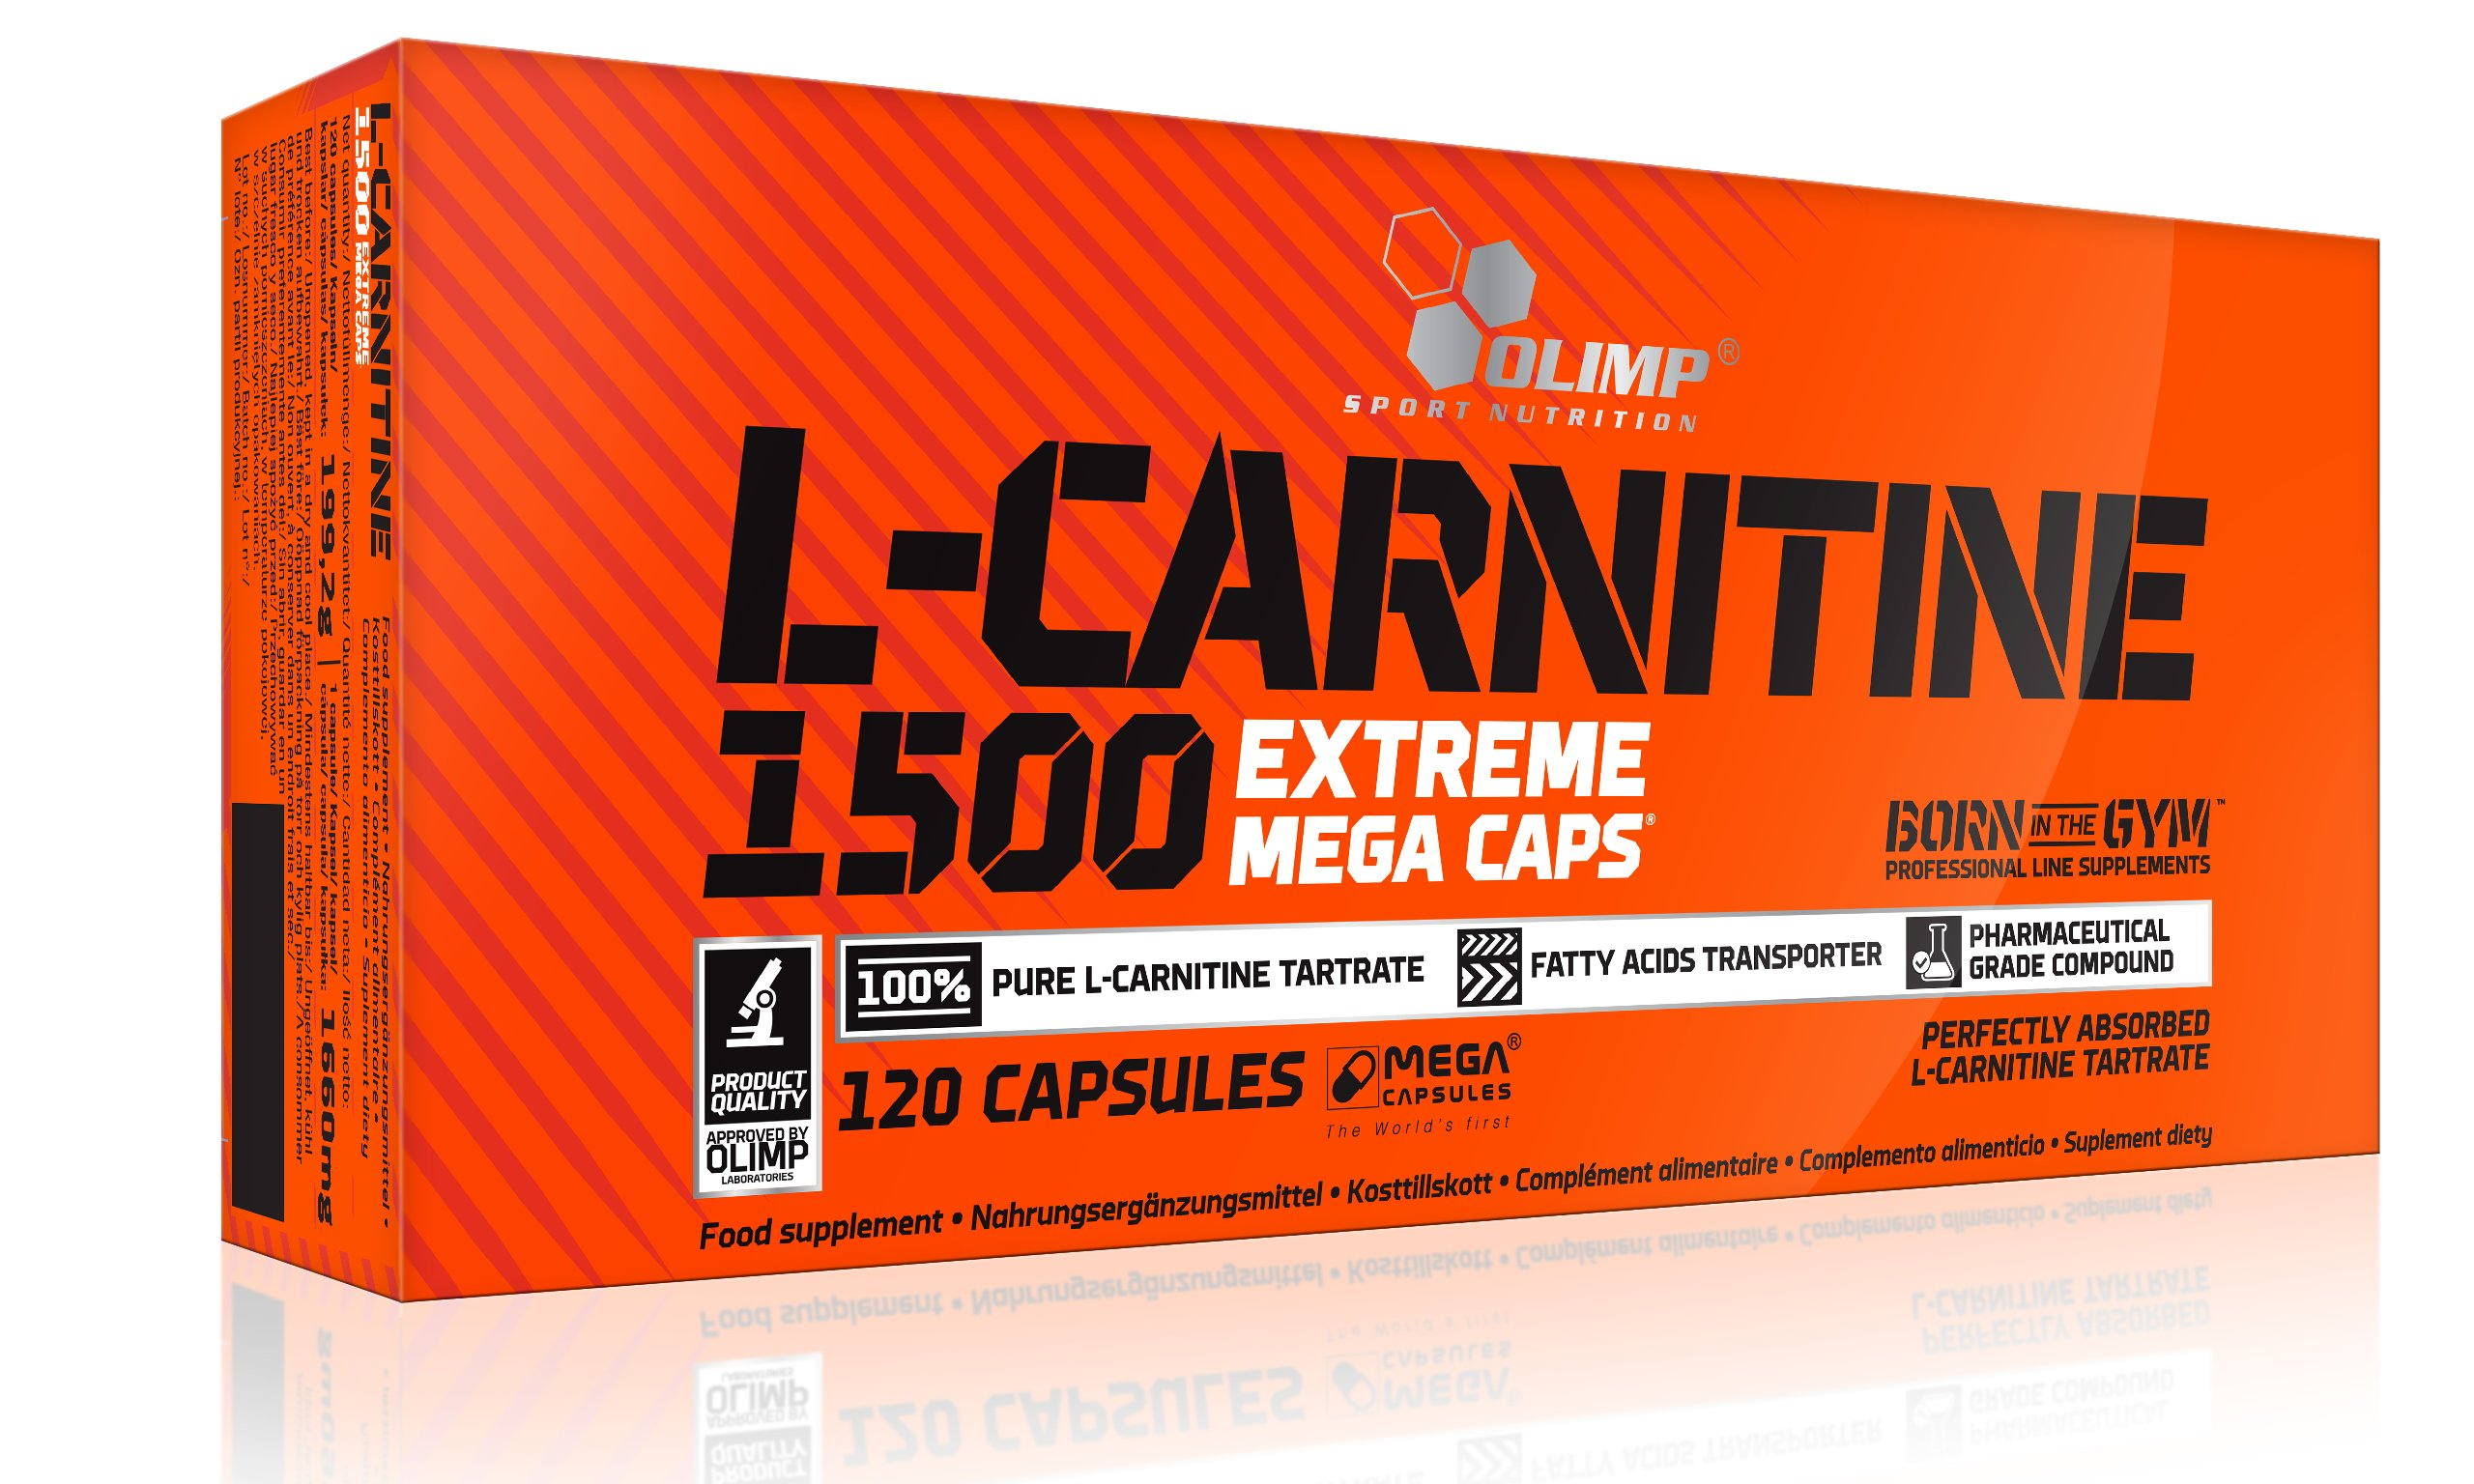 OLIMP L-CARNITINE 1500 EXTREME 120k.